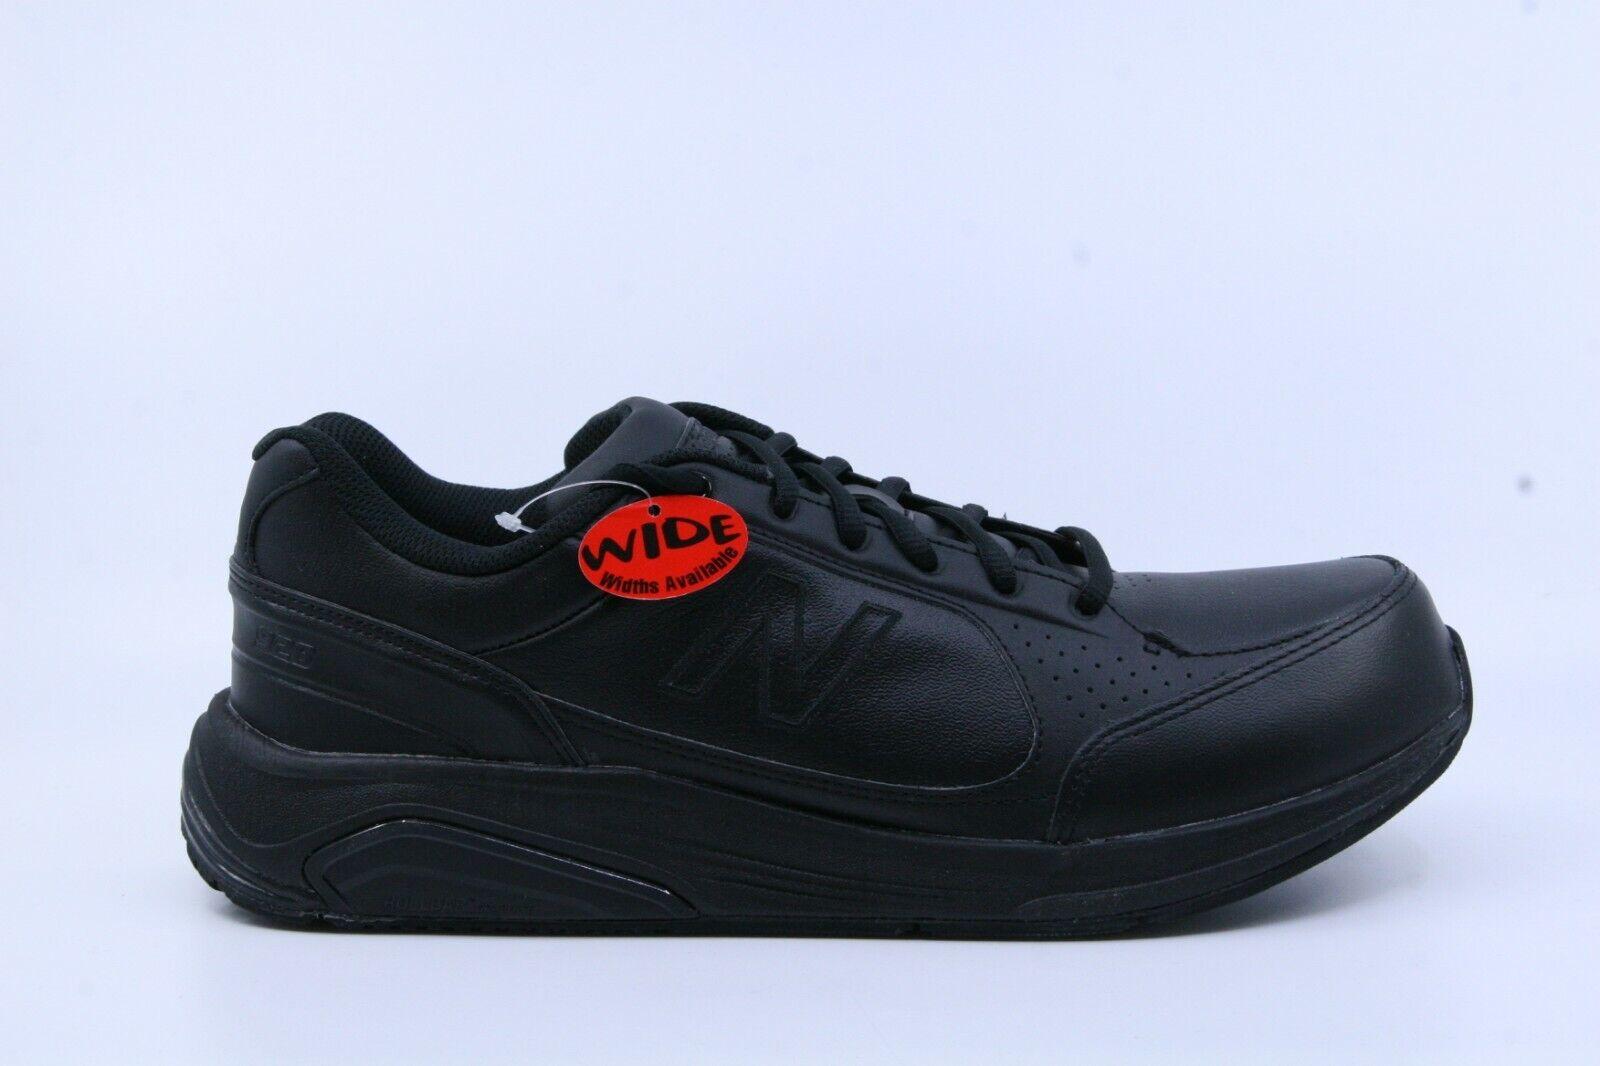 New Balance Men's Leather 928 (Wide Width) Black US12 MW928BK